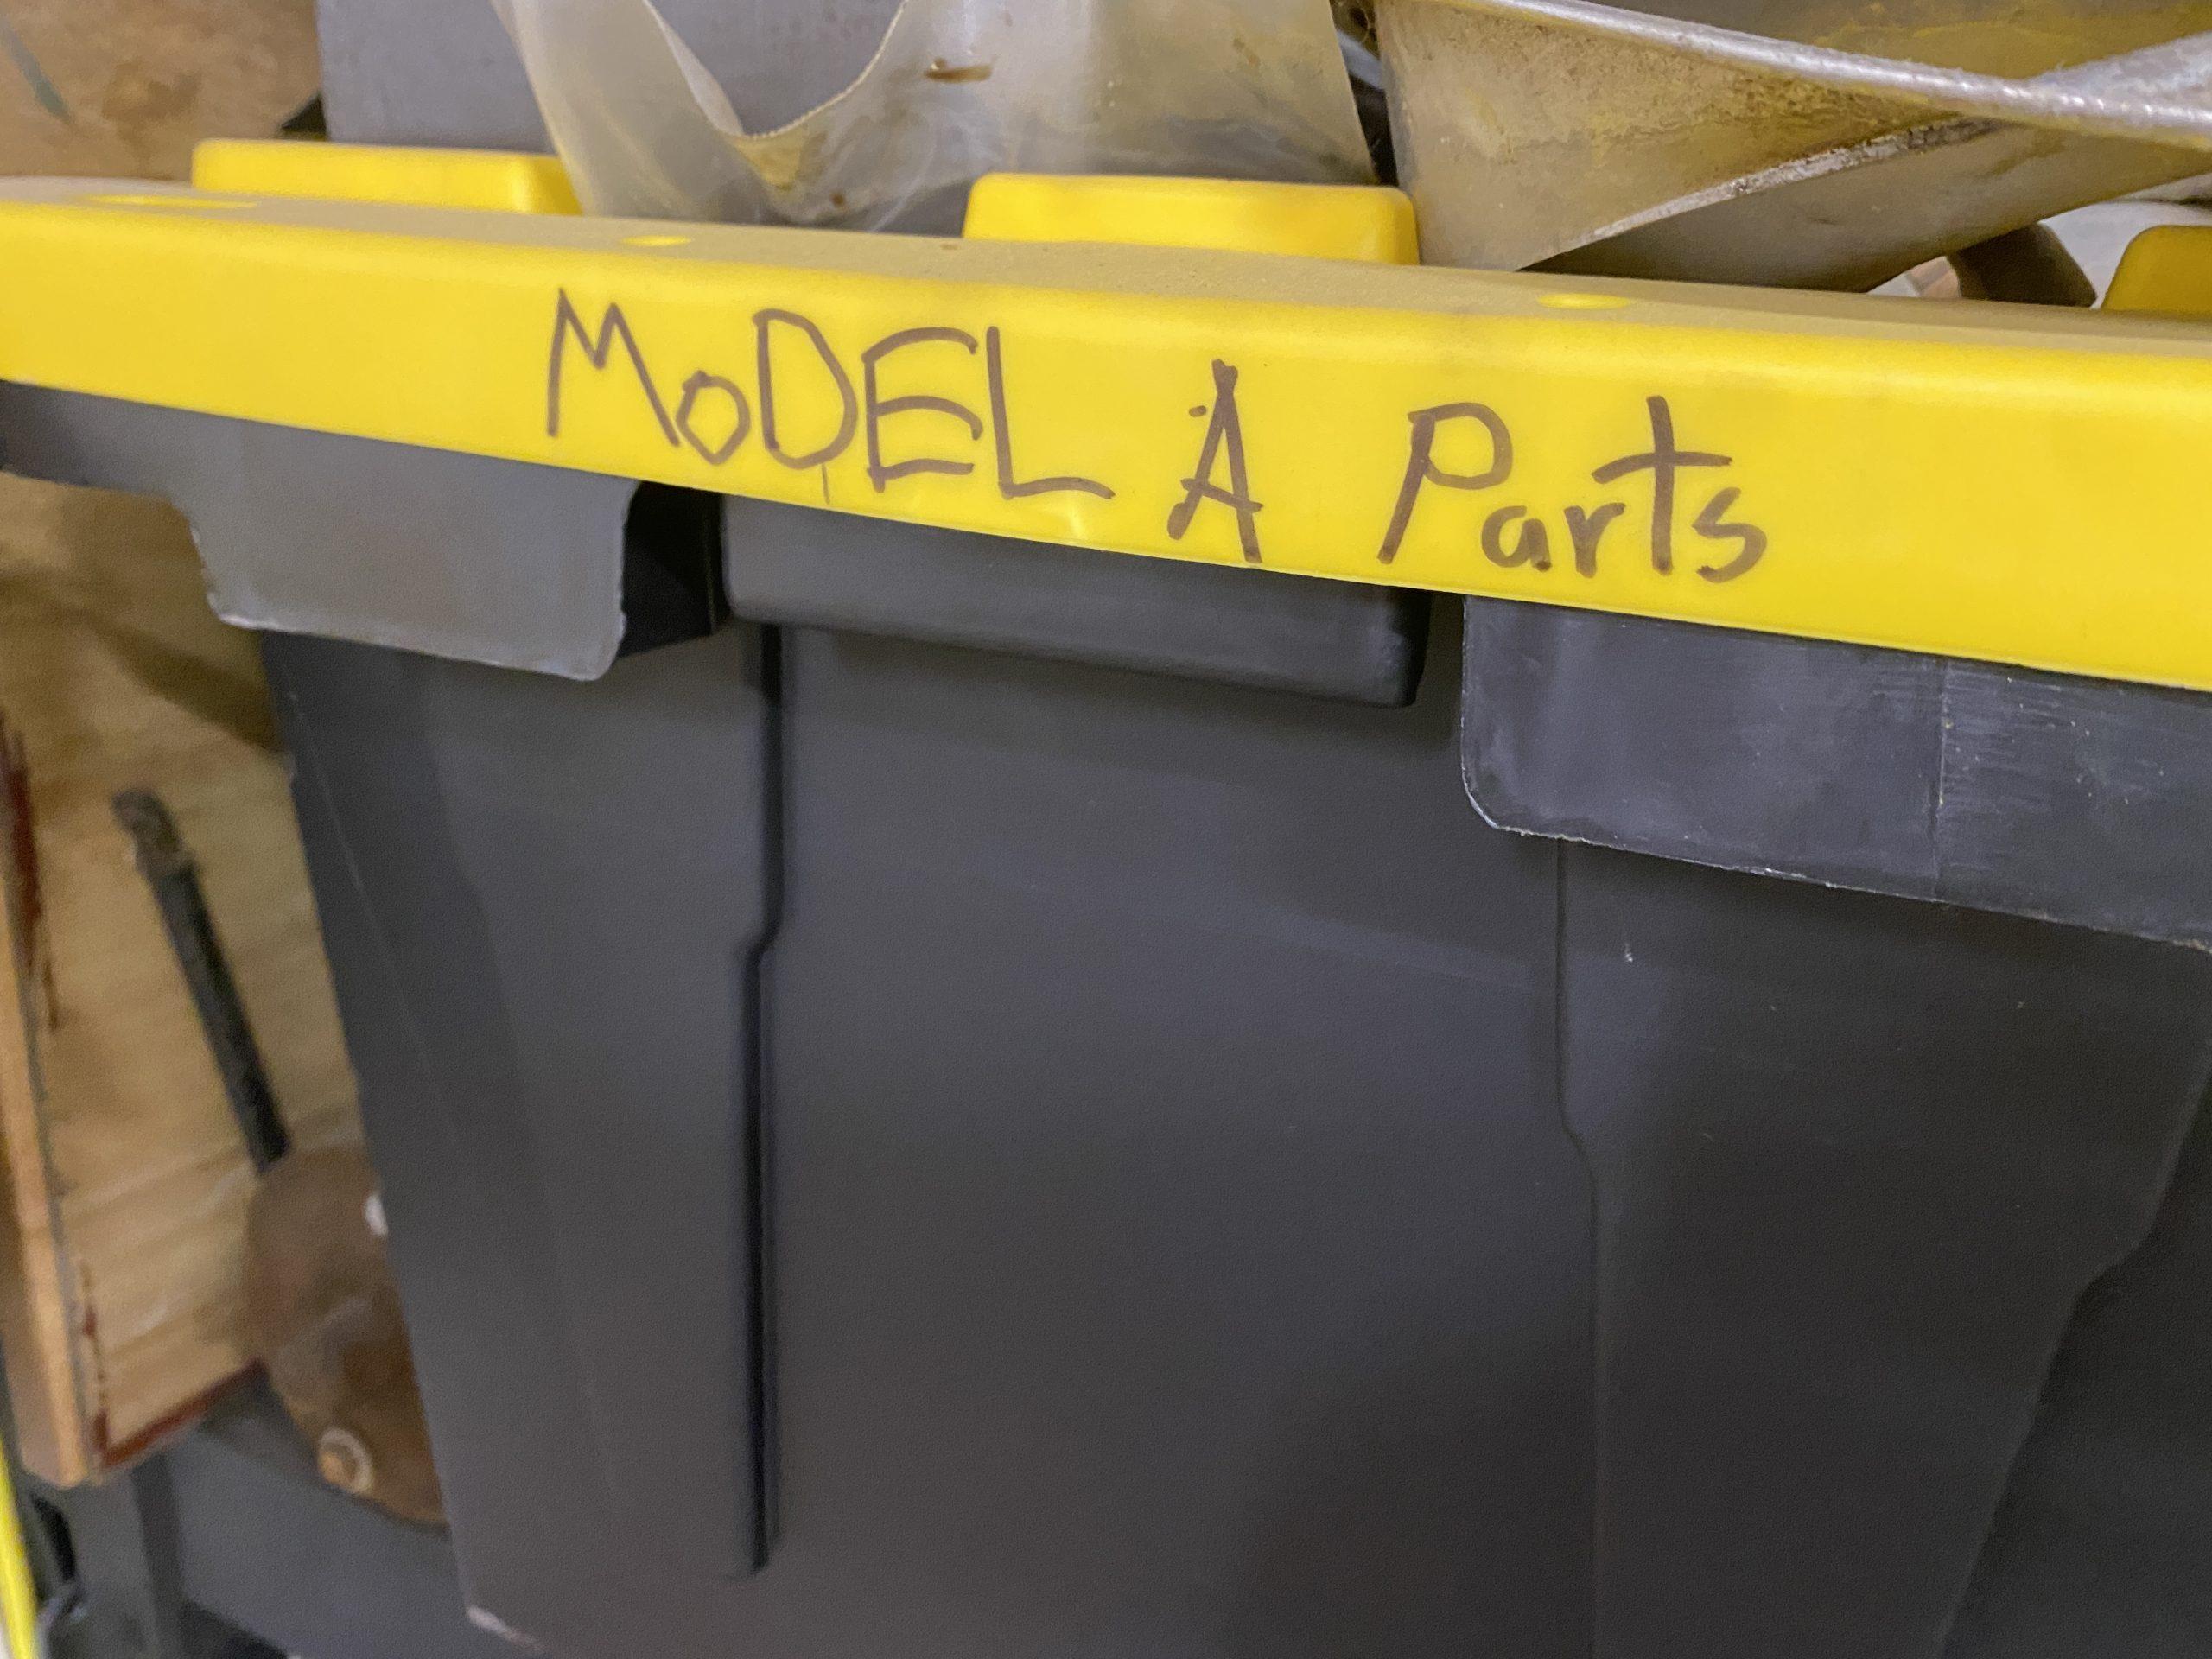 labeled bin